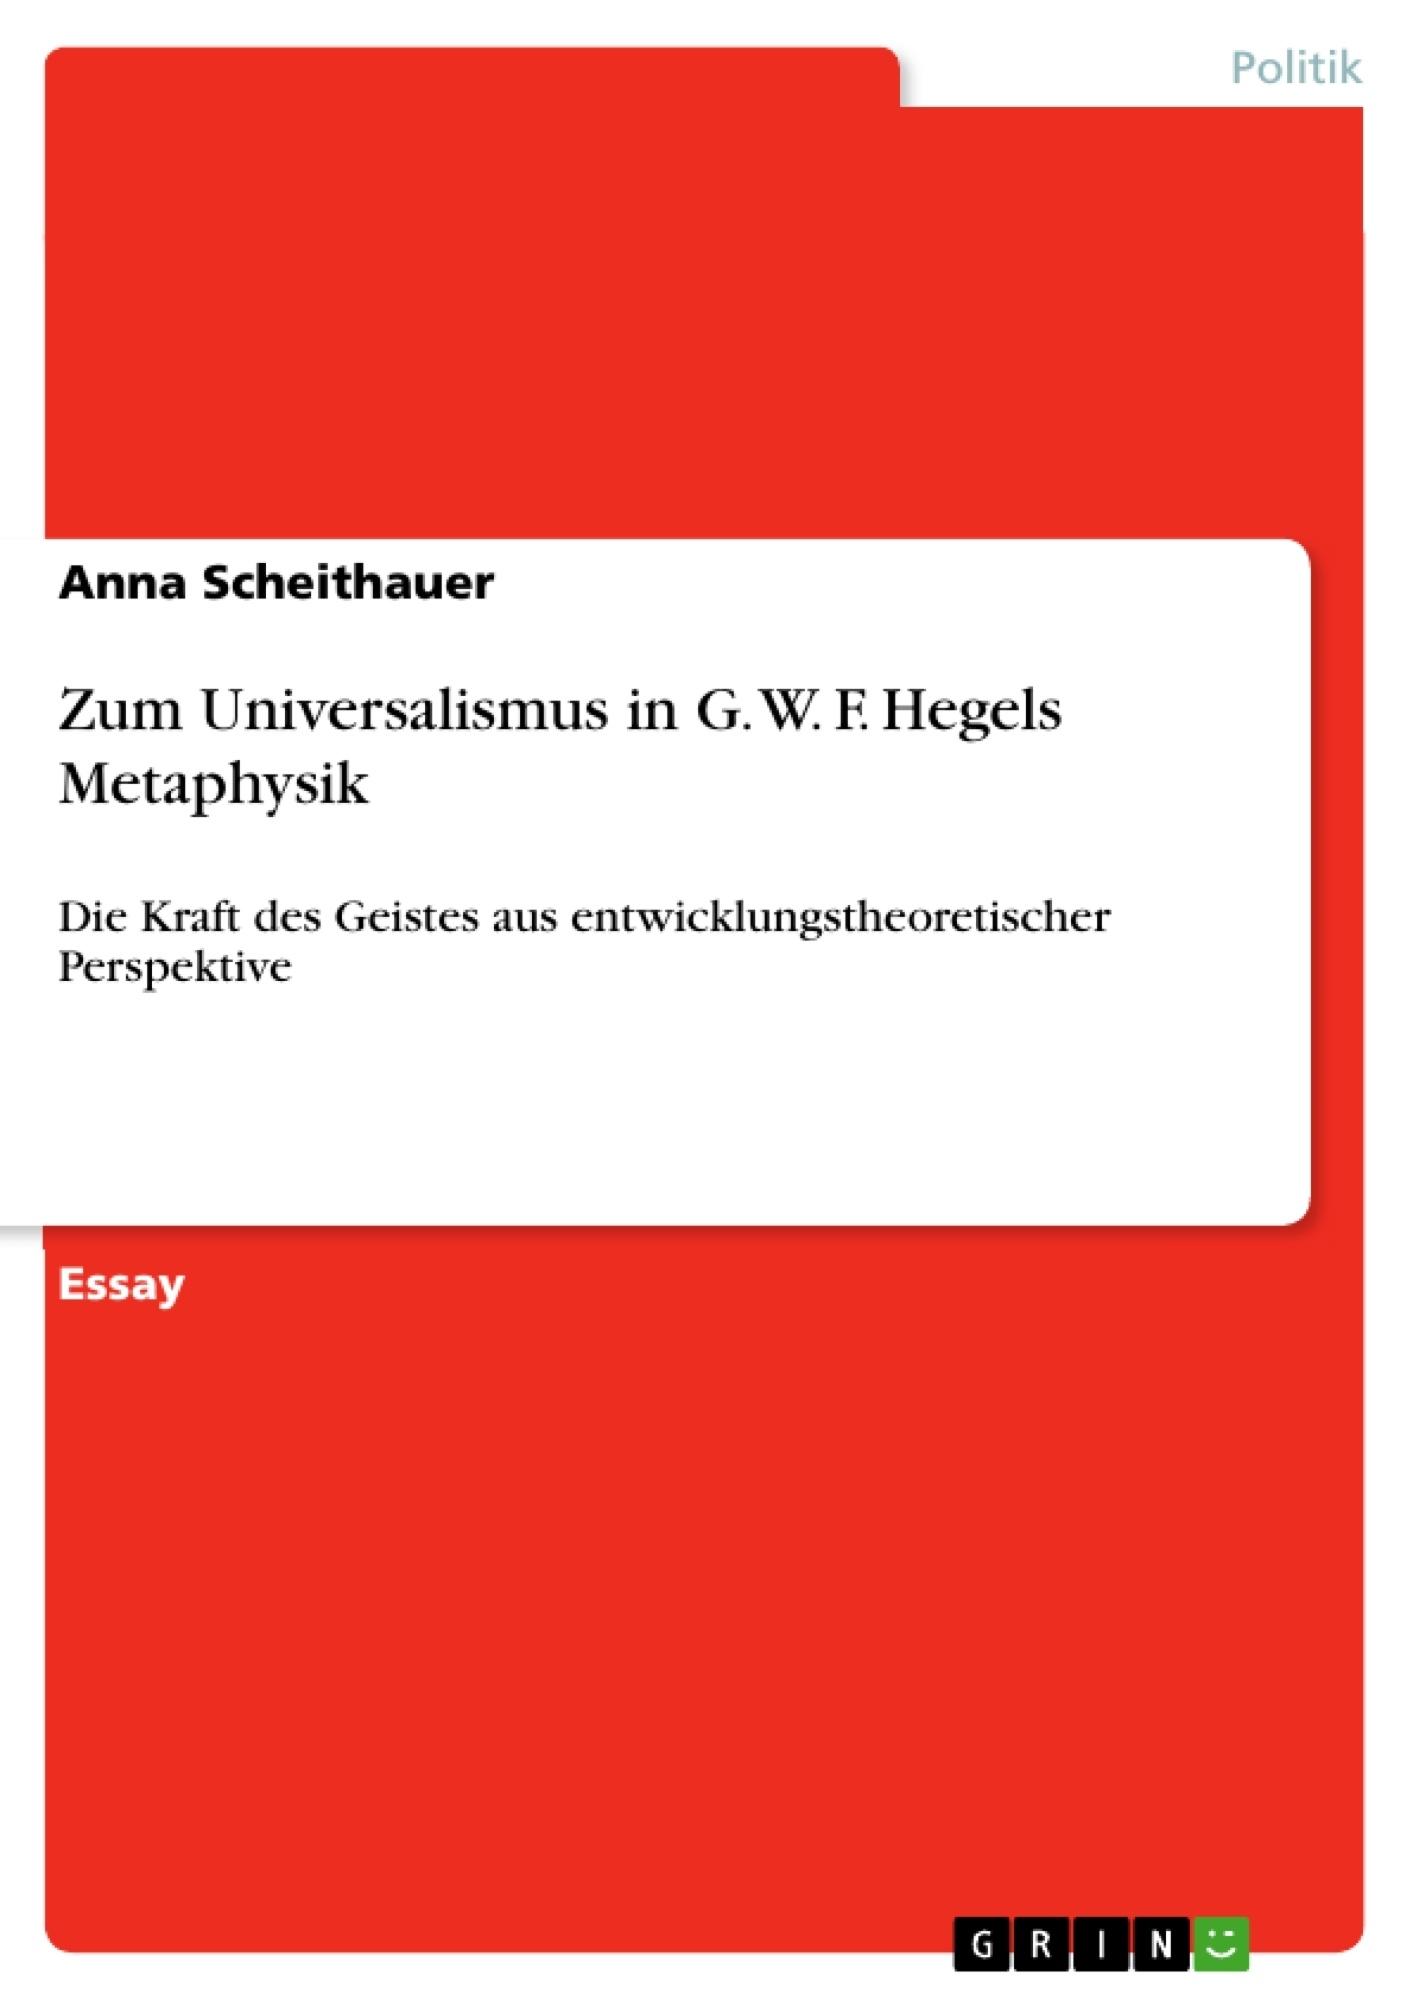 Titel: Zum Universalismus in G. W. F. Hegels Metaphysik